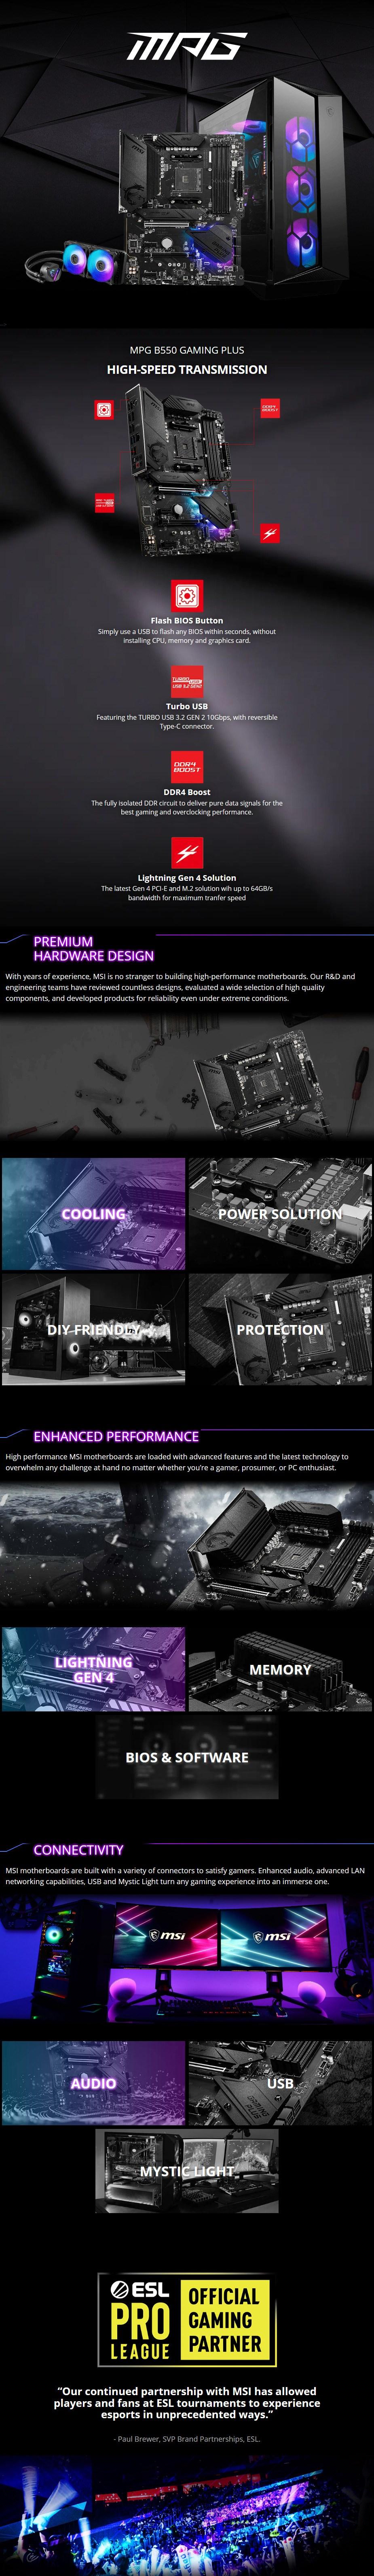 msi-mpg-b550-gaming-plus-am4-atx-motherboard-ac36453-10.jpg